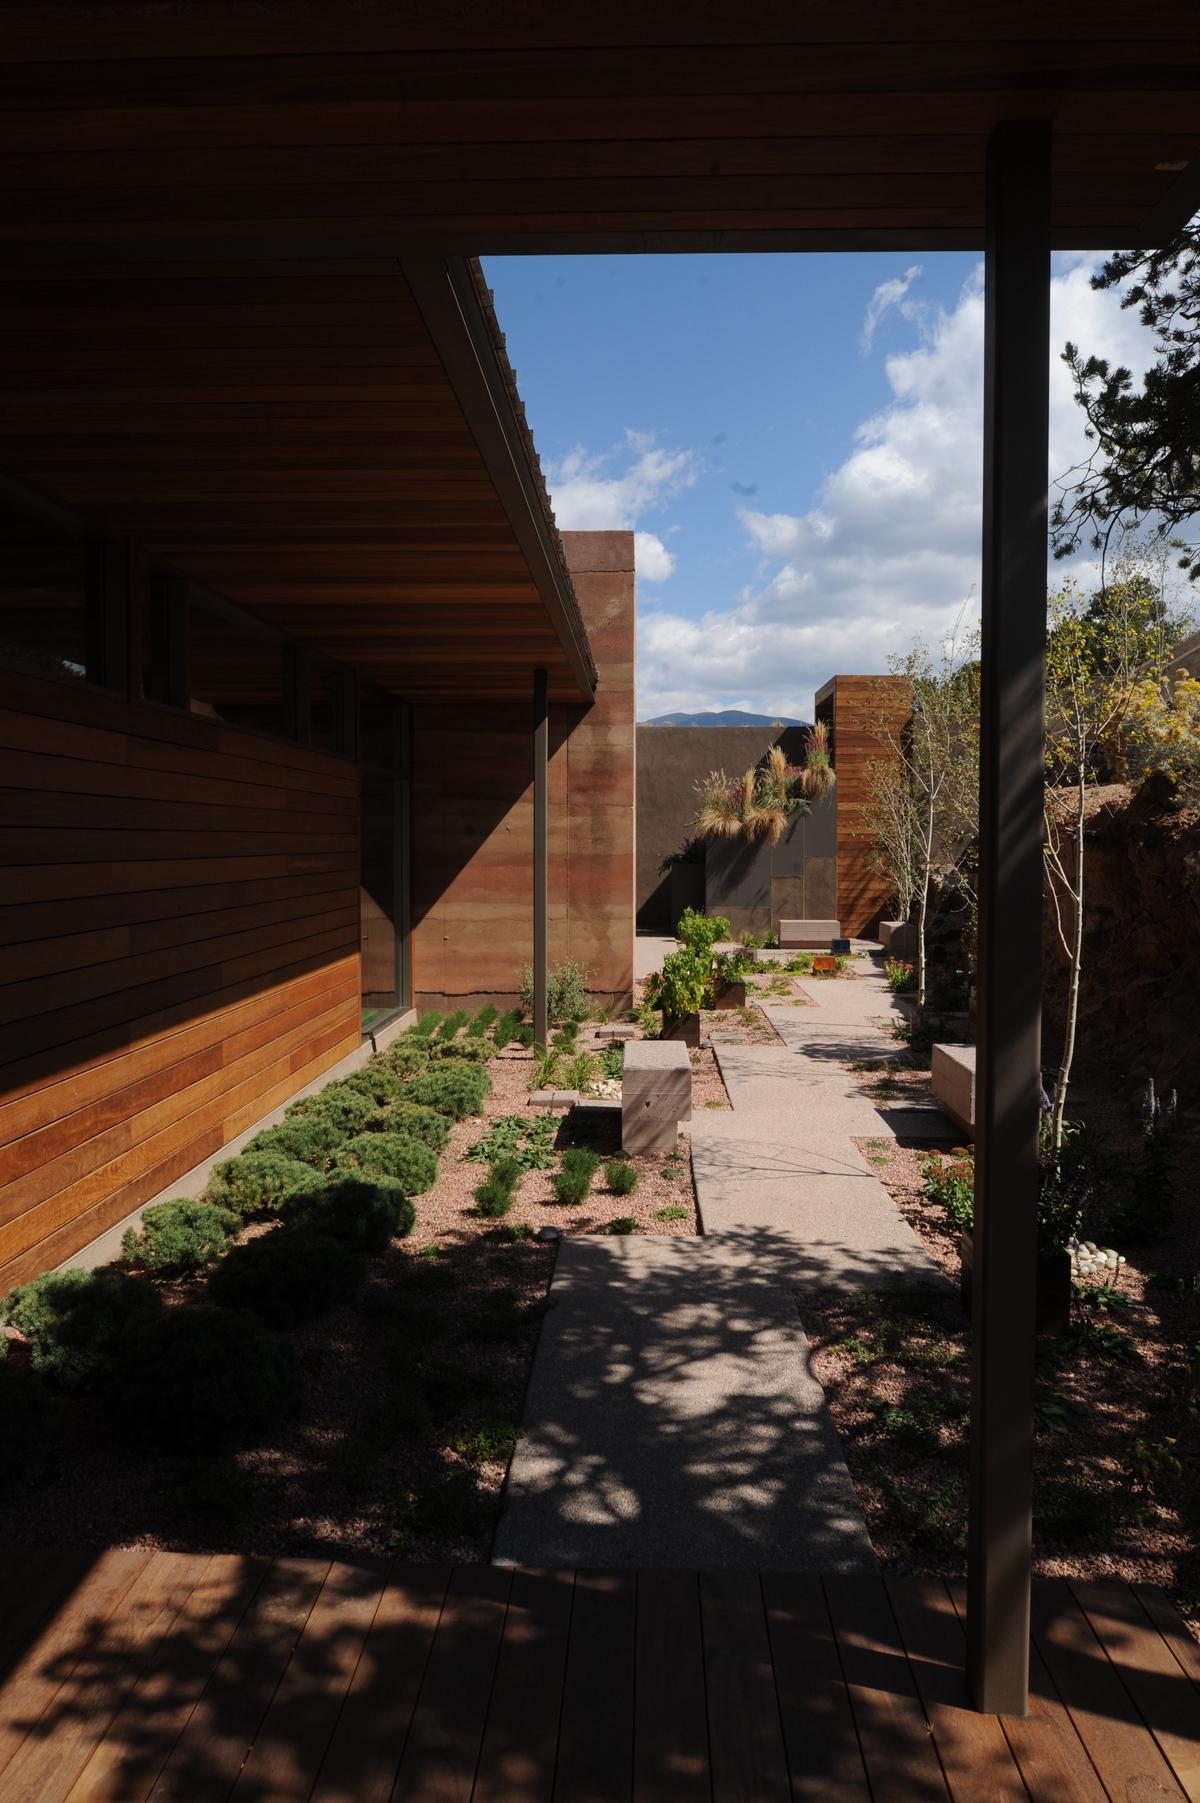 Shaded courtyard